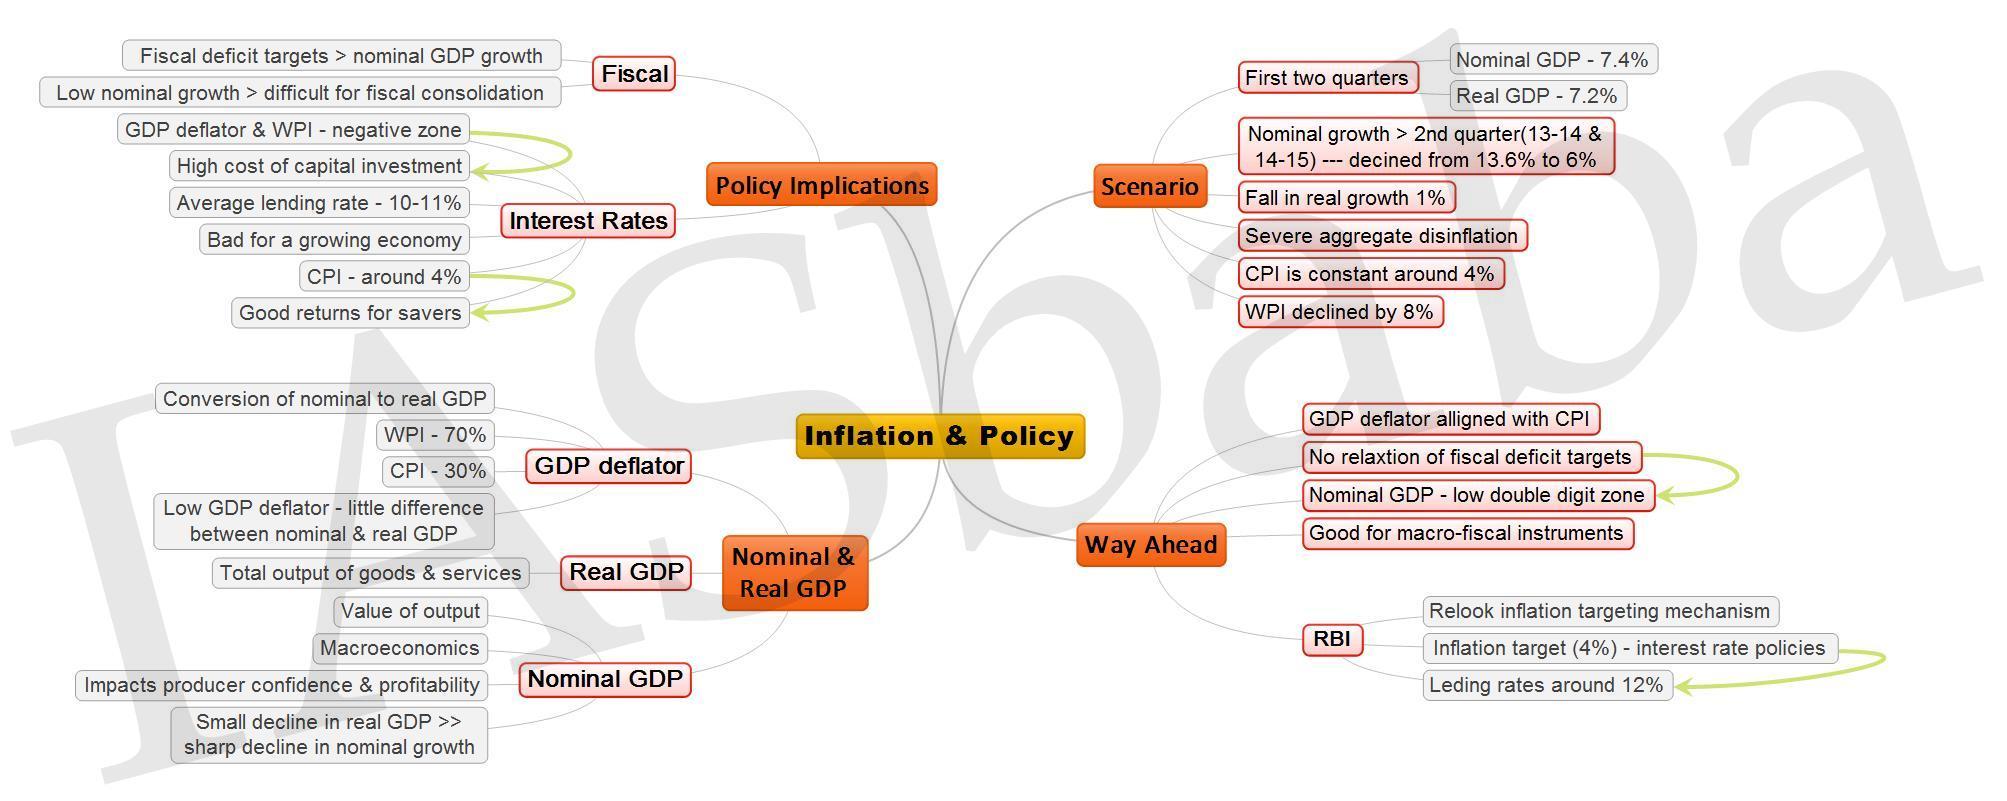 Inflation Policy.jpg JPG